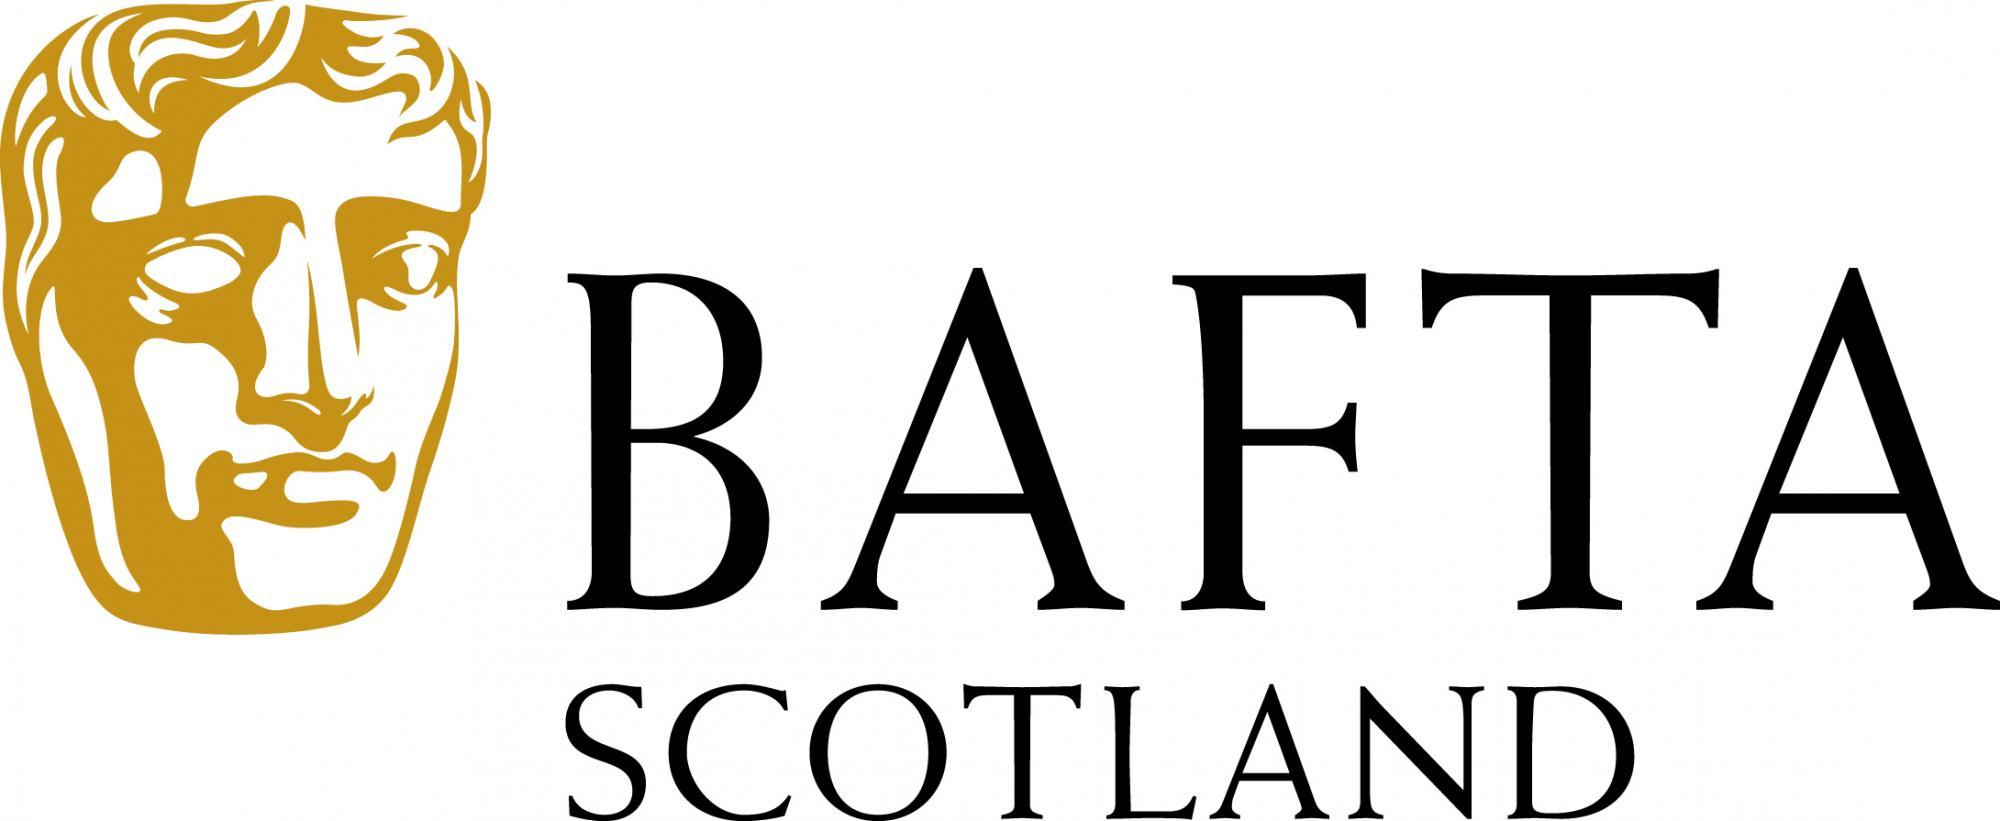 BAFTA_BRANCHES_SCOTLAND_ABBREV_RGB_POS_LARGE.jpg